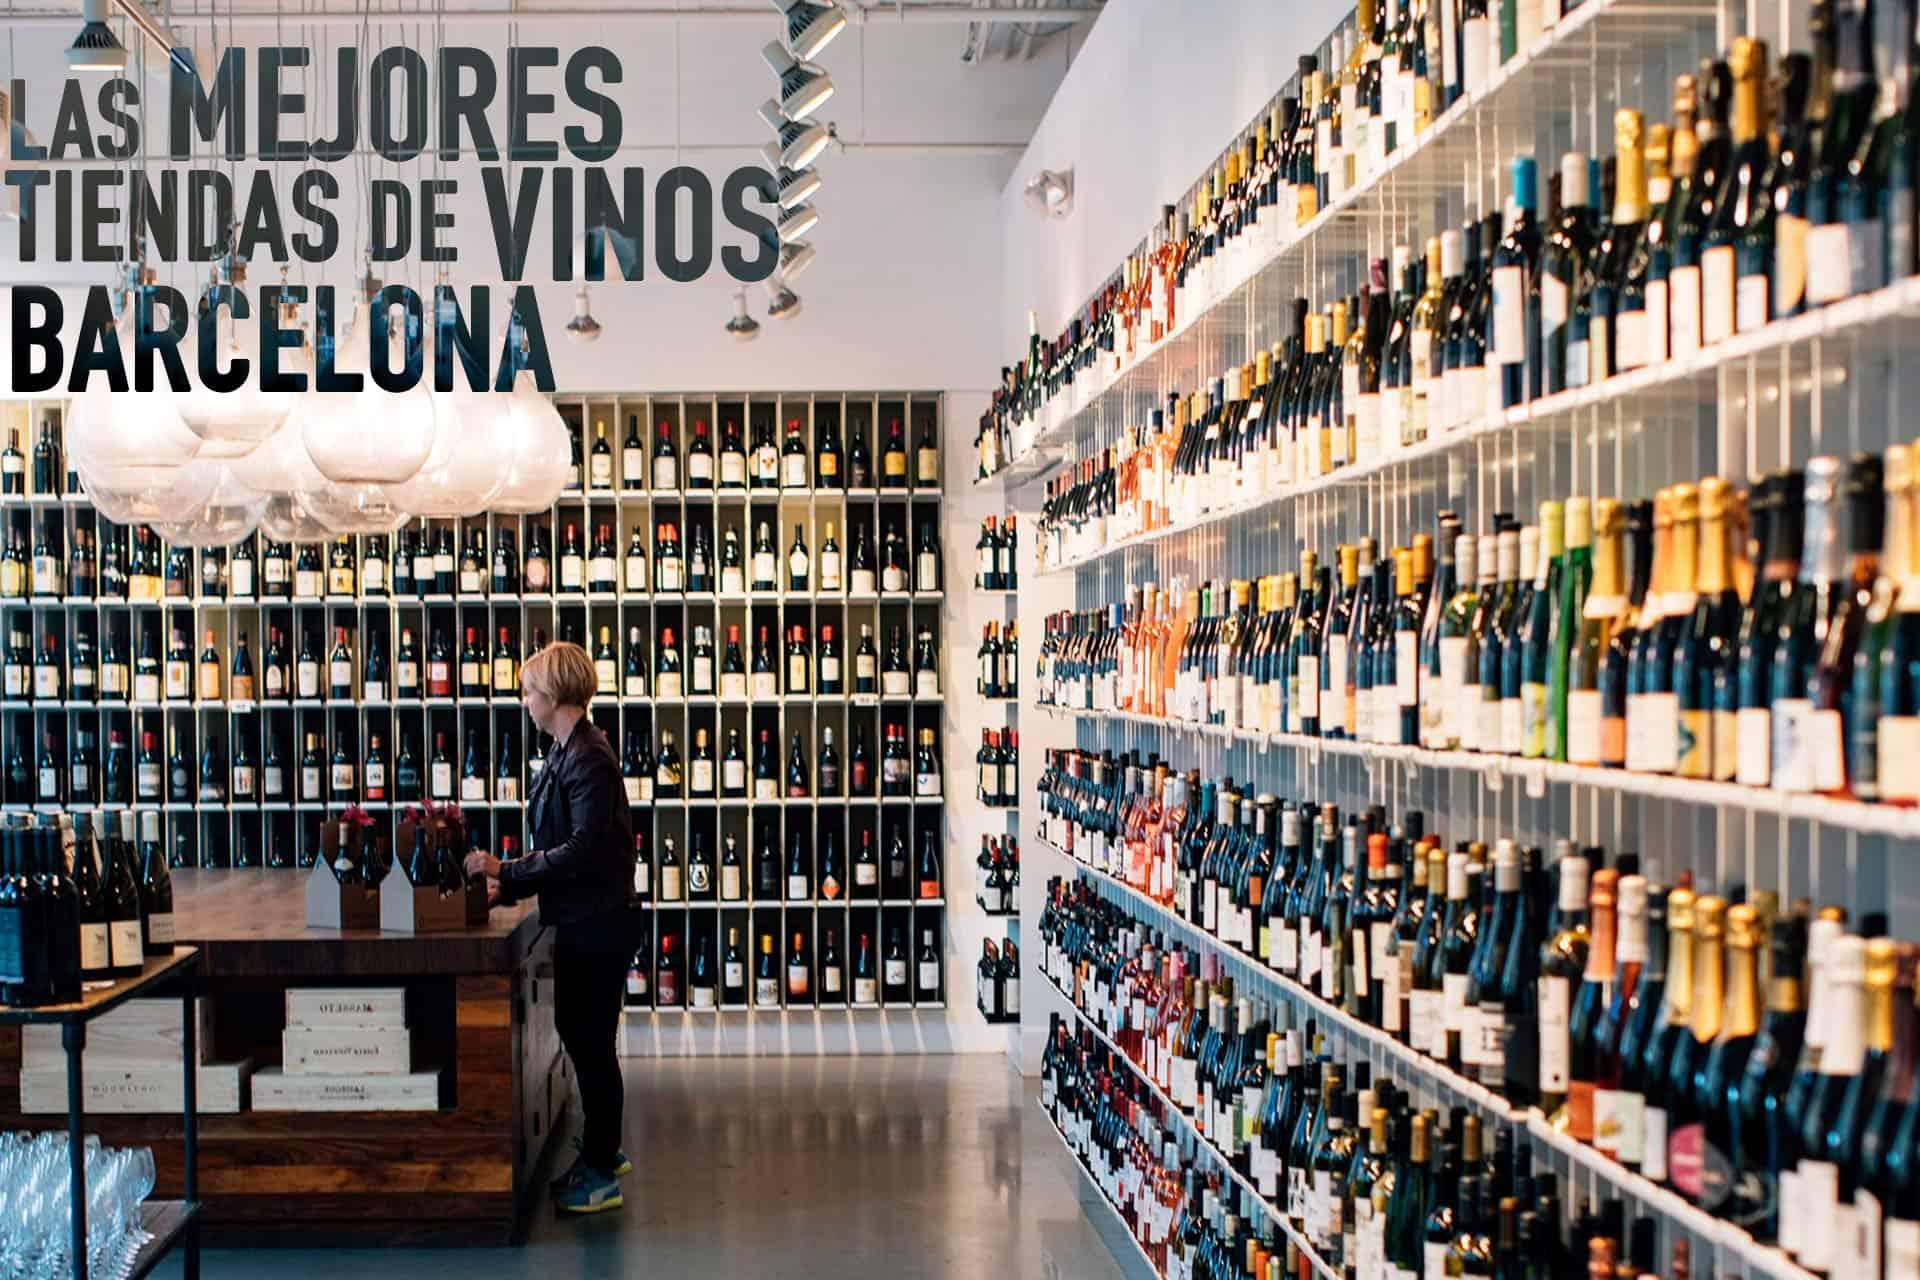 Tiendas de vinos de Barcelona Gastromarkit